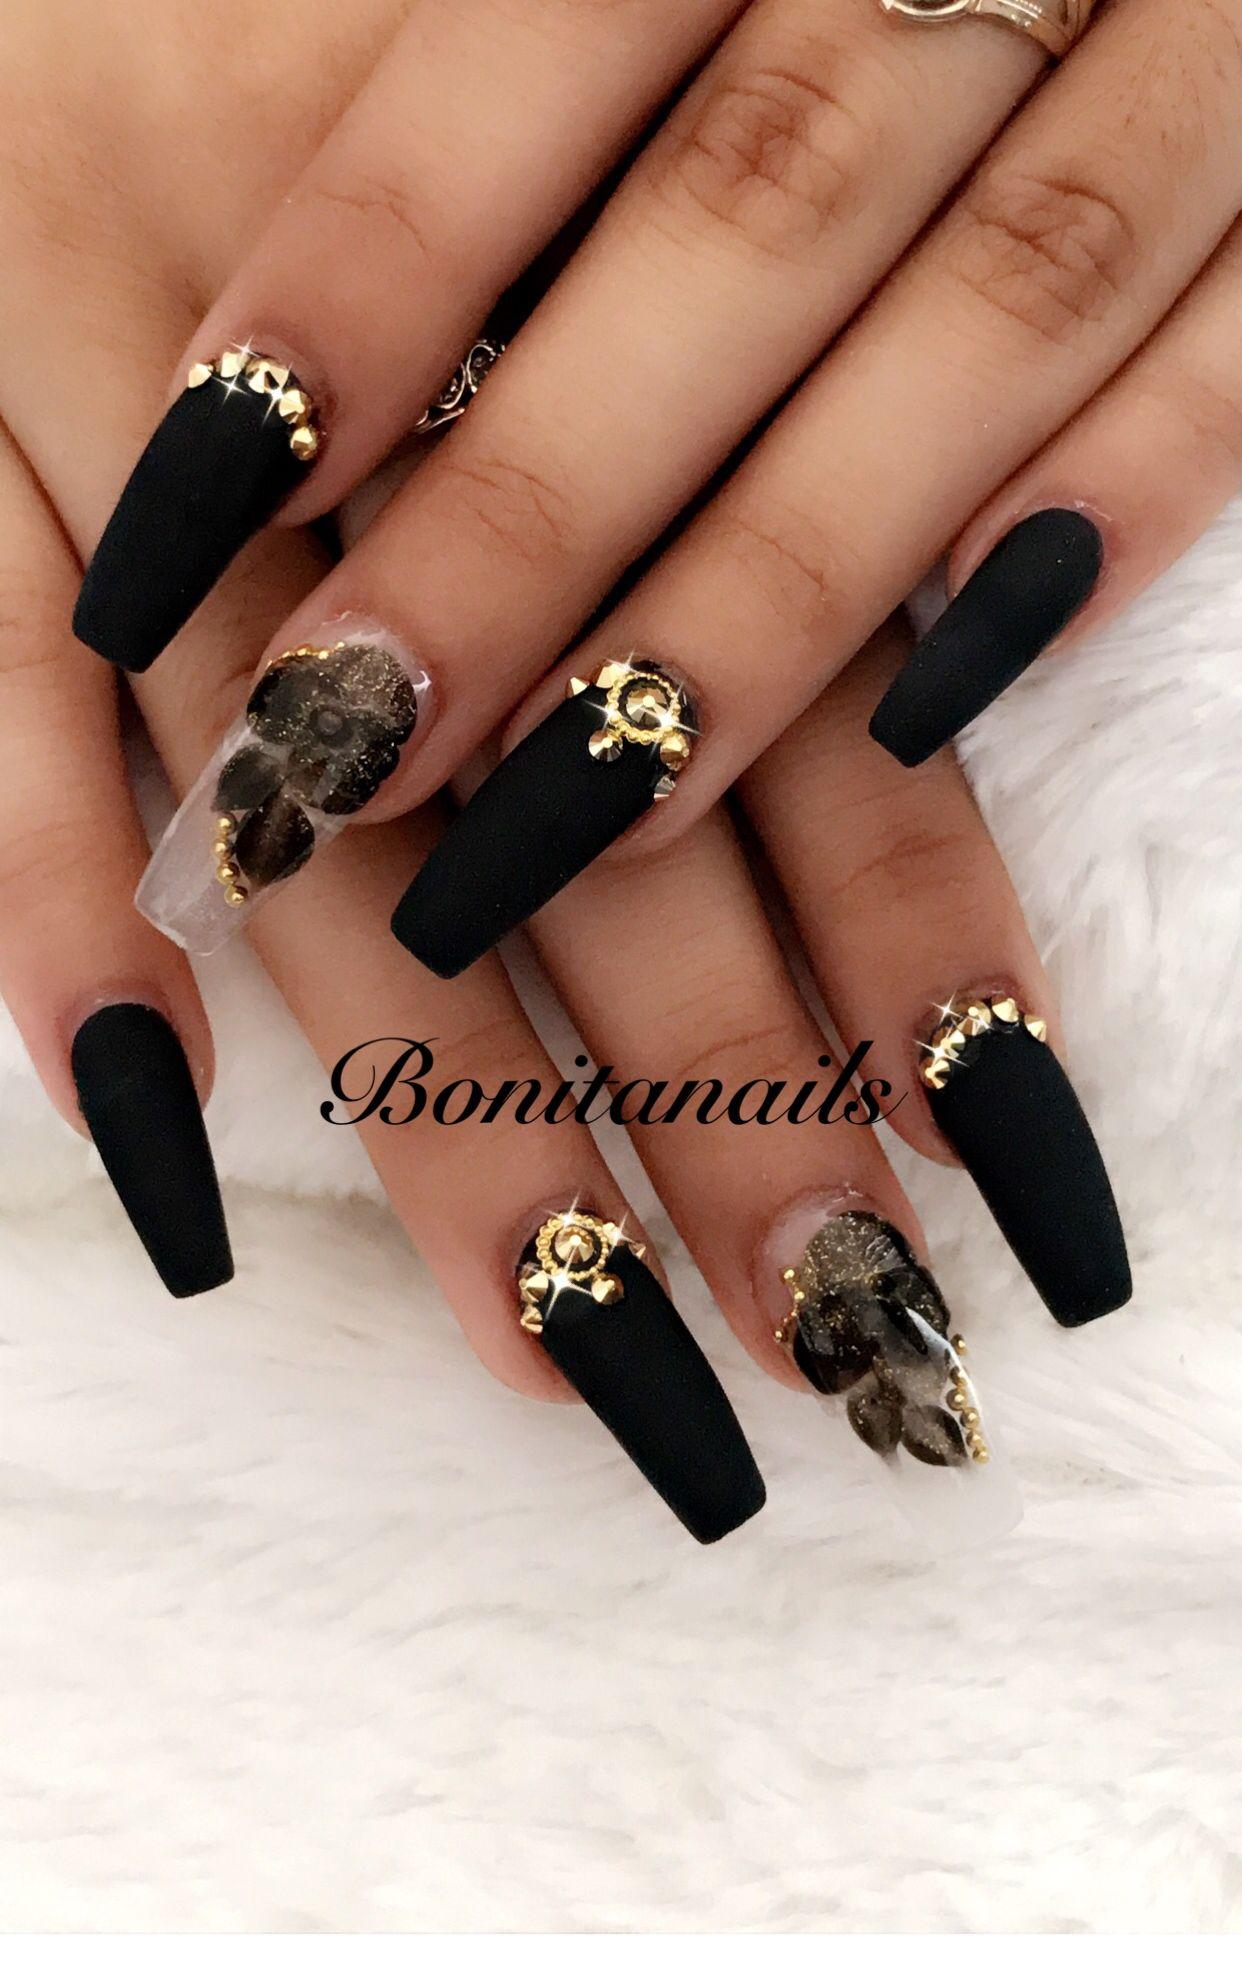 𝓢𝓮𝓿𝓲𝓮 𝓚𝓷𝓸𝔀𝓵𝓽𝓸𝓷 Uña Pinterest Nail Designs